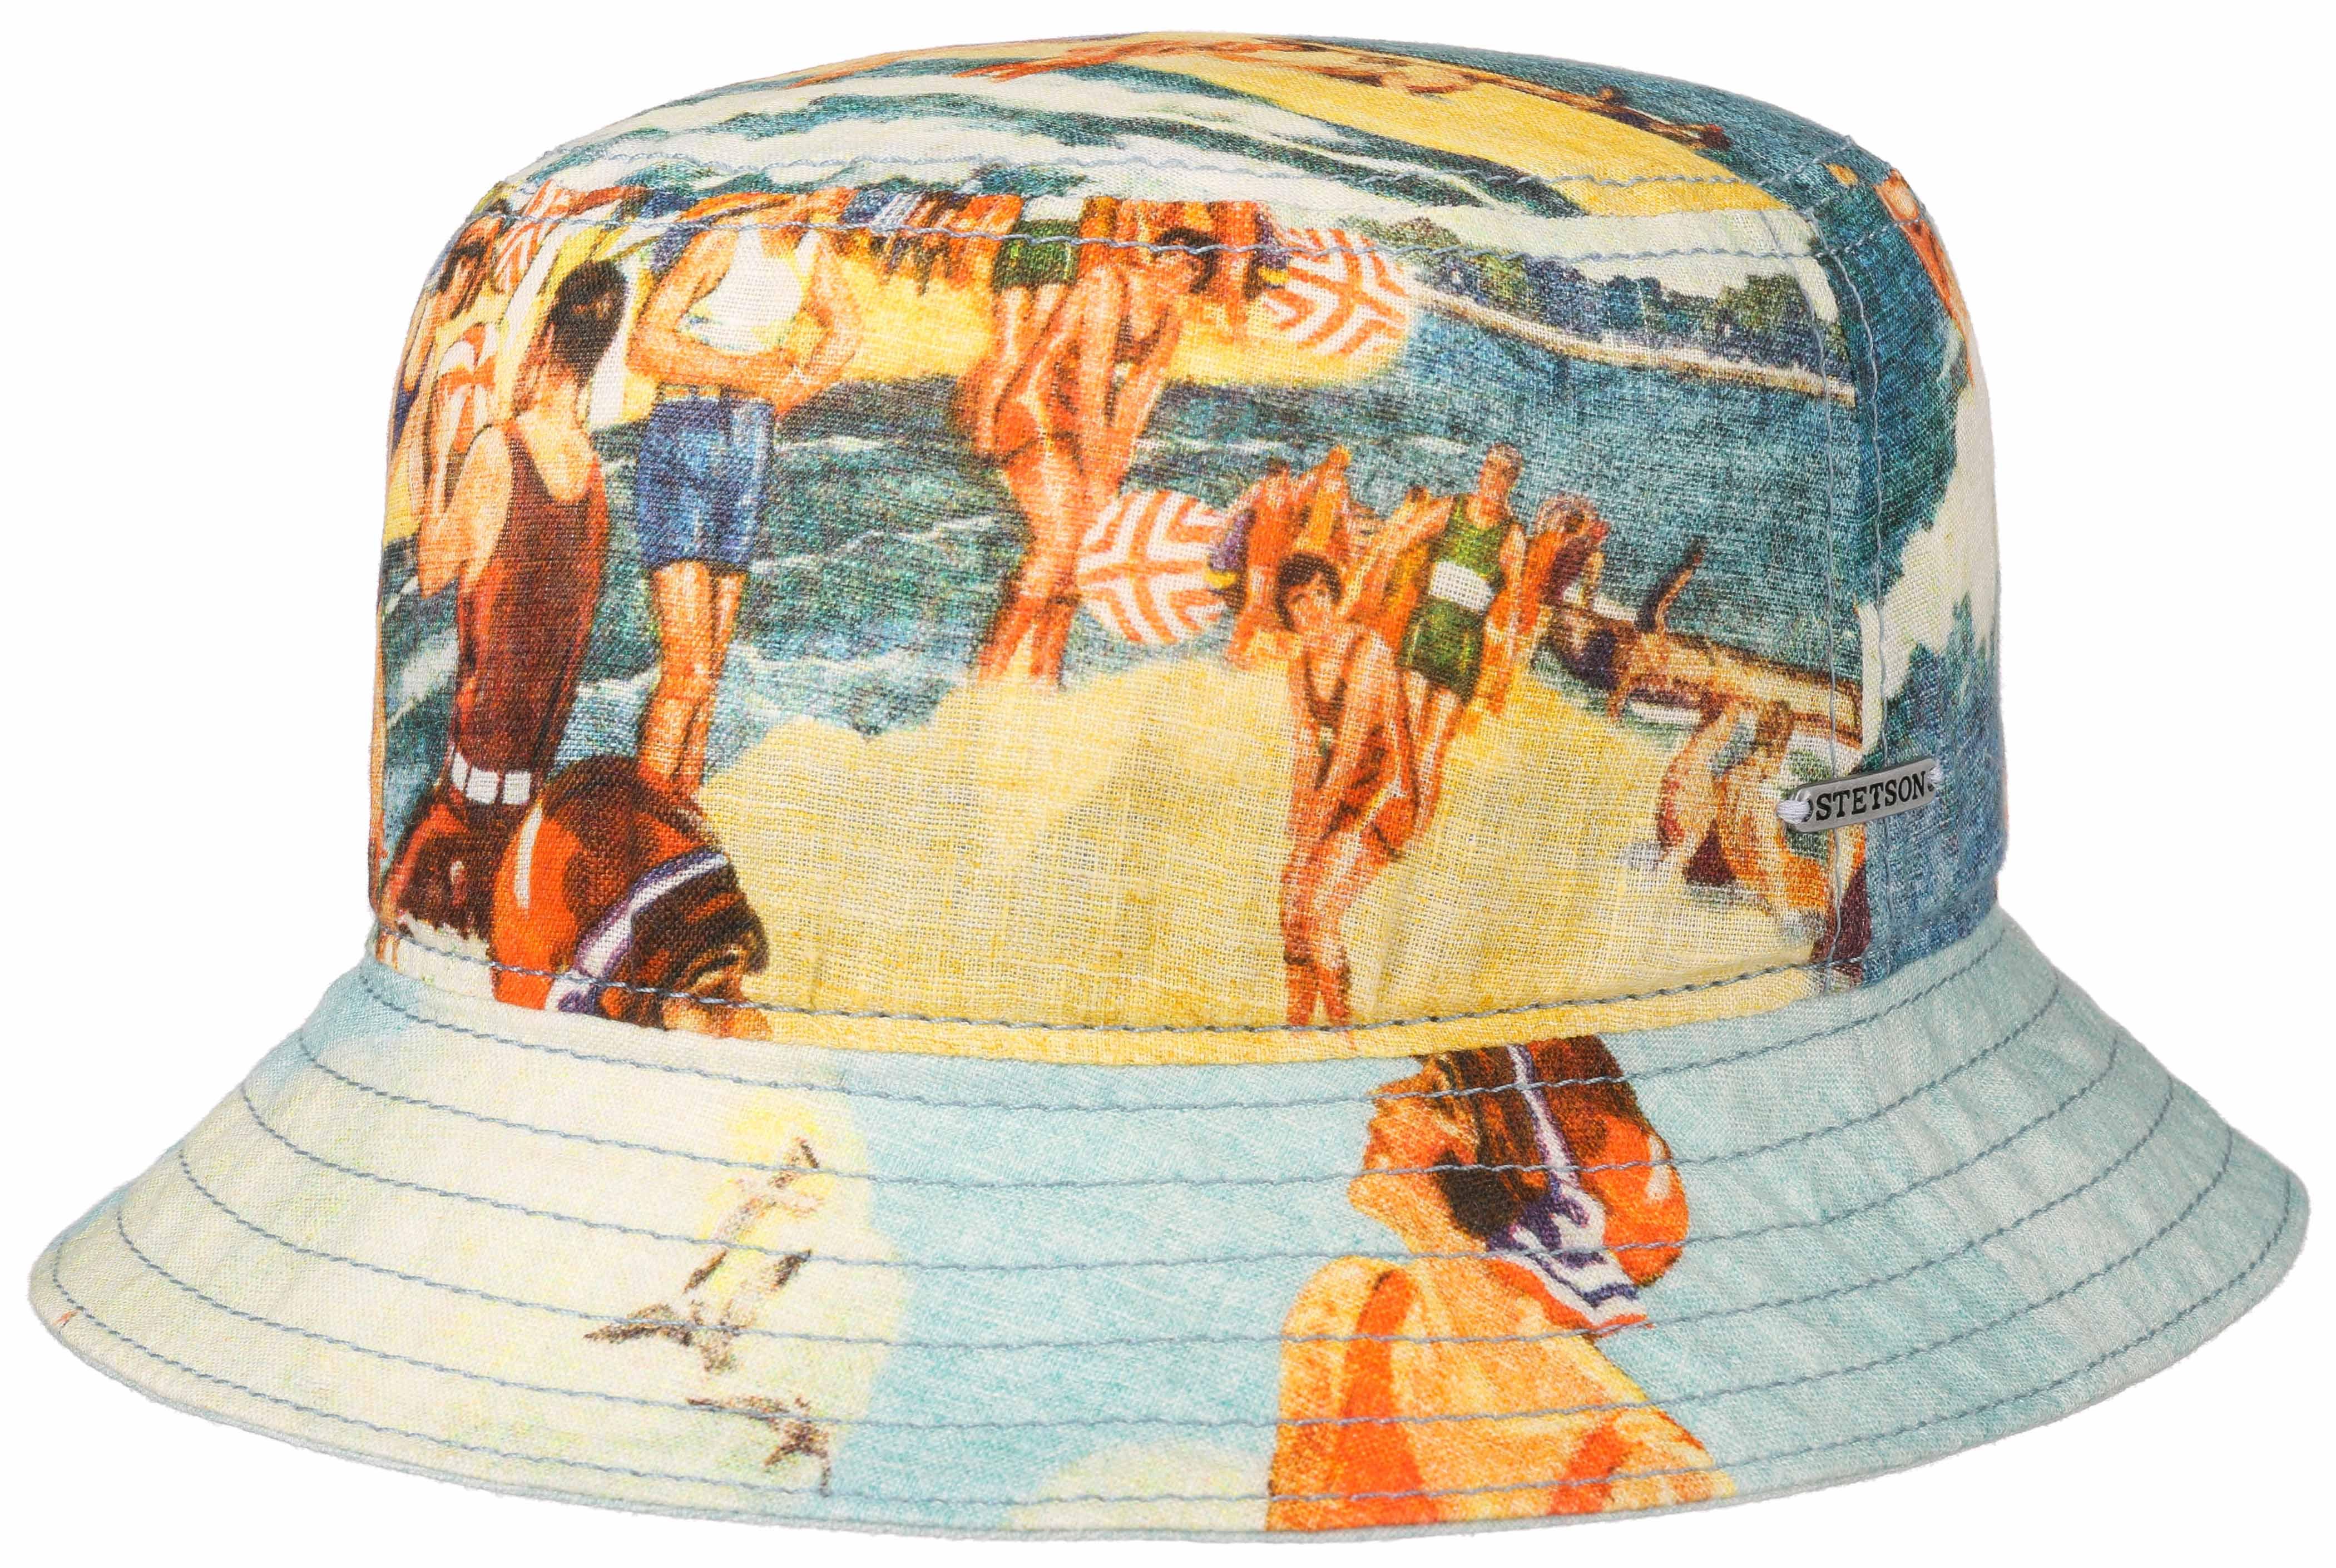 Deauville Bucket Hat L